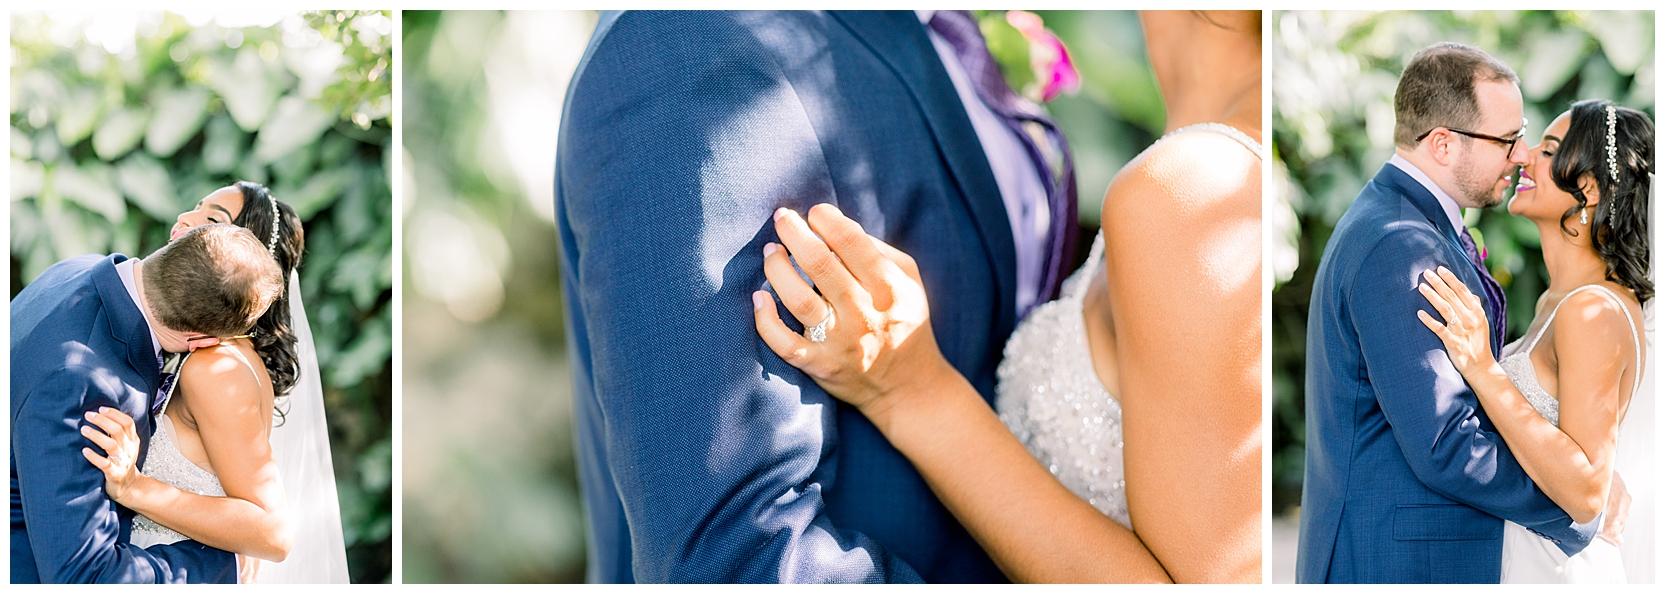 jessicafredericks_lakeland_tampa_wedding_purple_crazy hour_0026.jpg